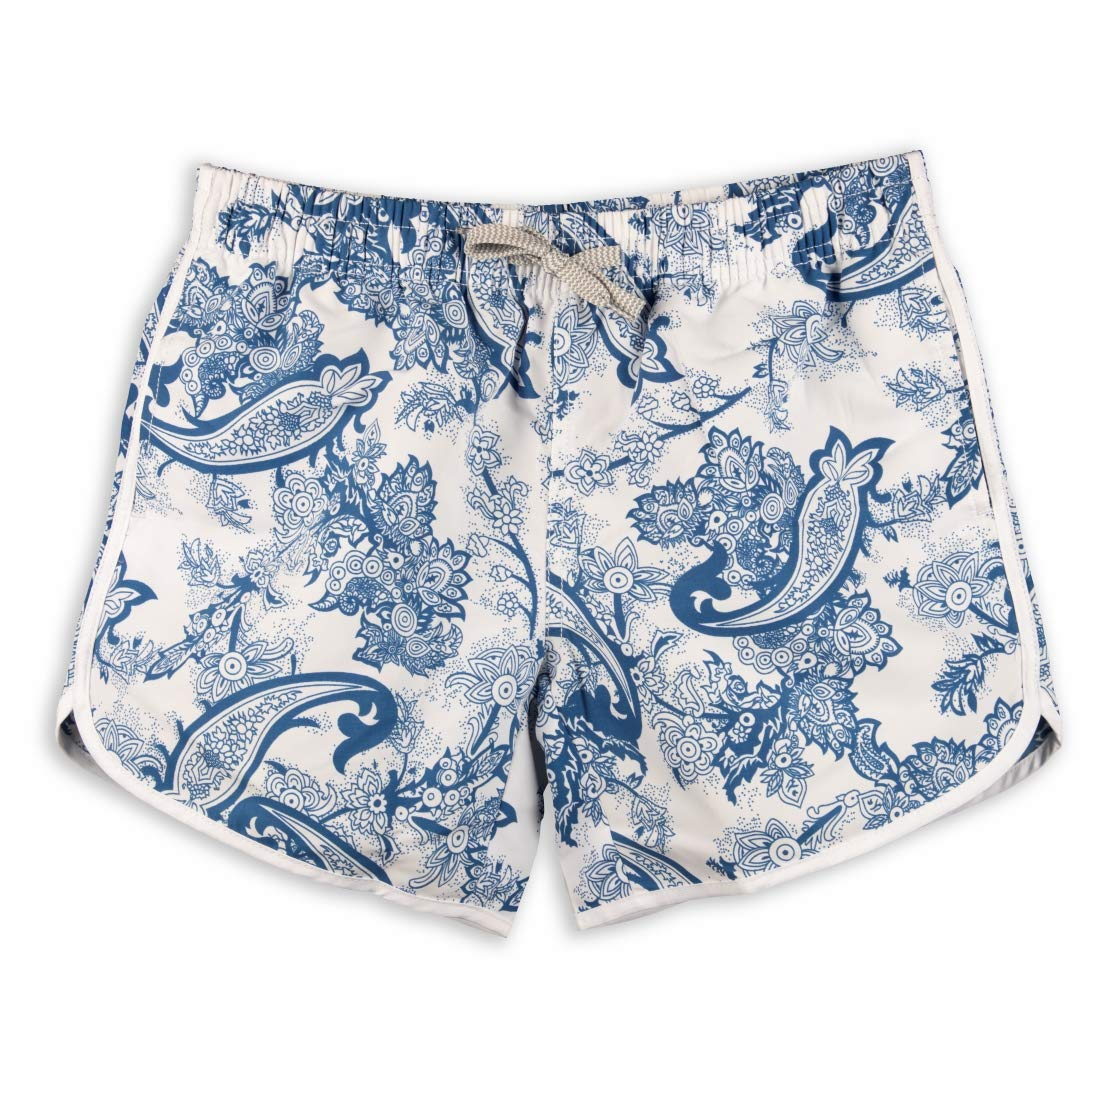 Porcelainbluee PREFER TO LIFE Womens Board Shorts Beach Quick Dry Fabric Swim Slim Trunks Ocean Travel Sports